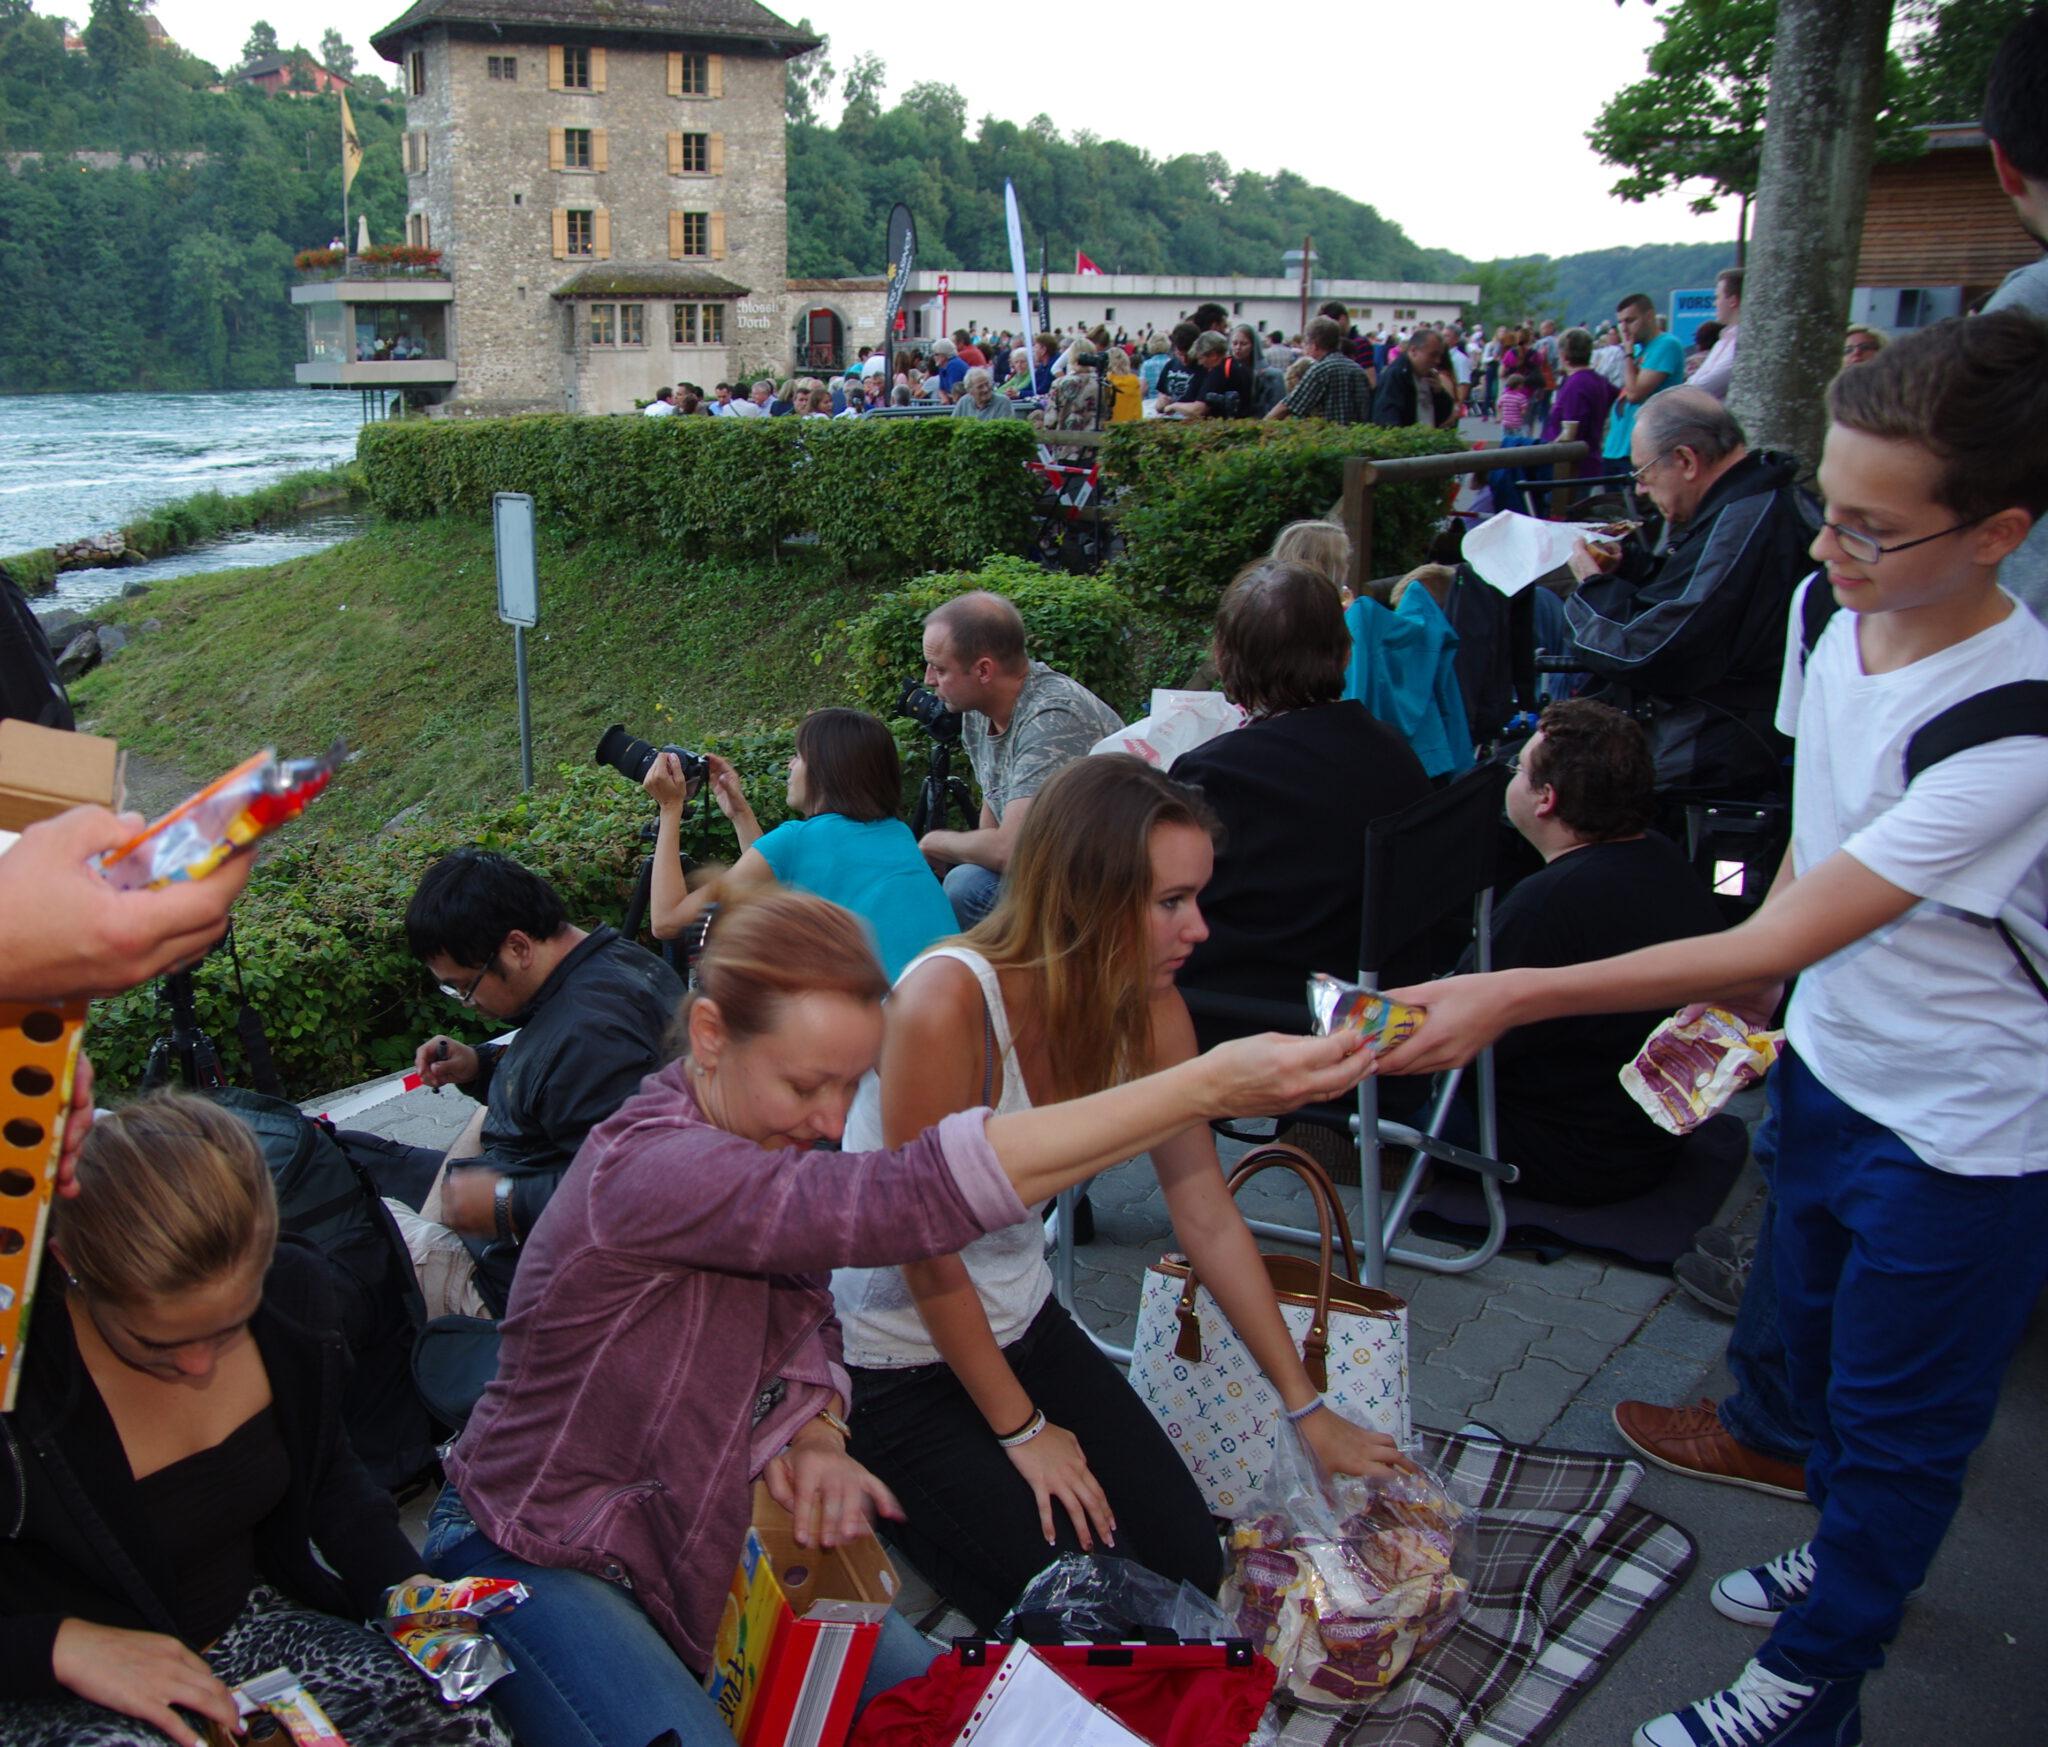 Jahr 2014. Kindertanzclub bravO. Ausflüg zum Rheinfall.